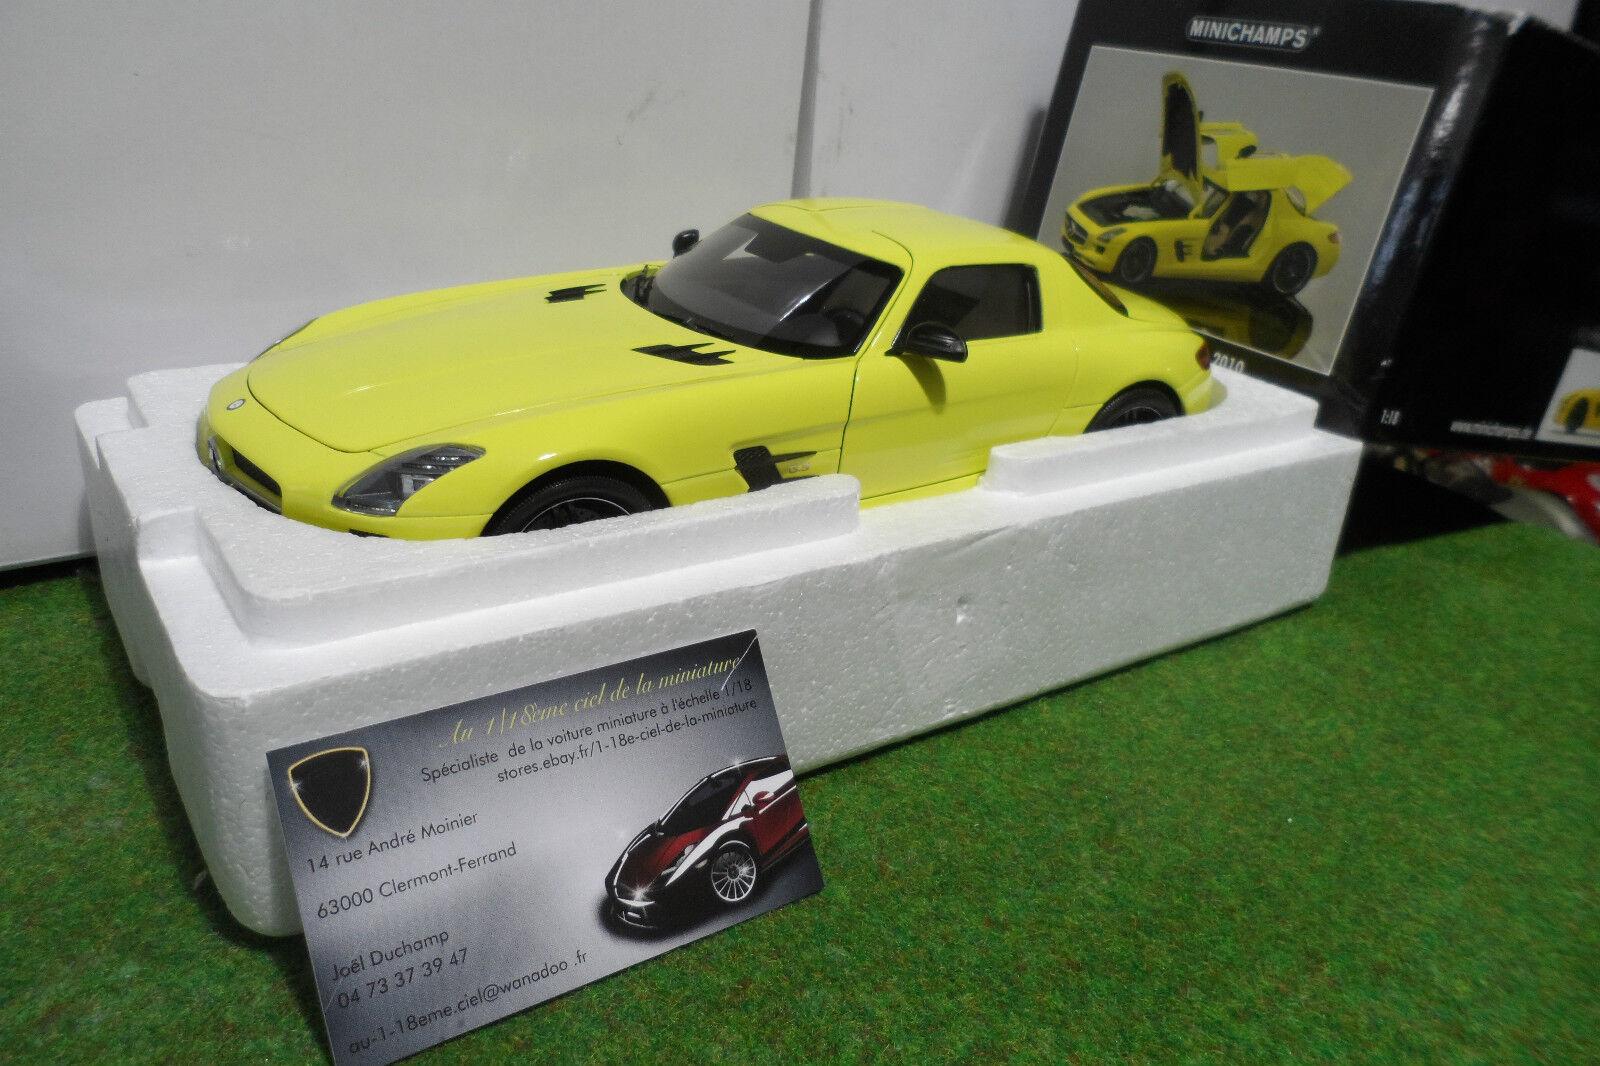 MERCEDES-BENZ SLS AMG 2010 jne 1 18 MINICHAMPS 100039022 voiture miniature coll.